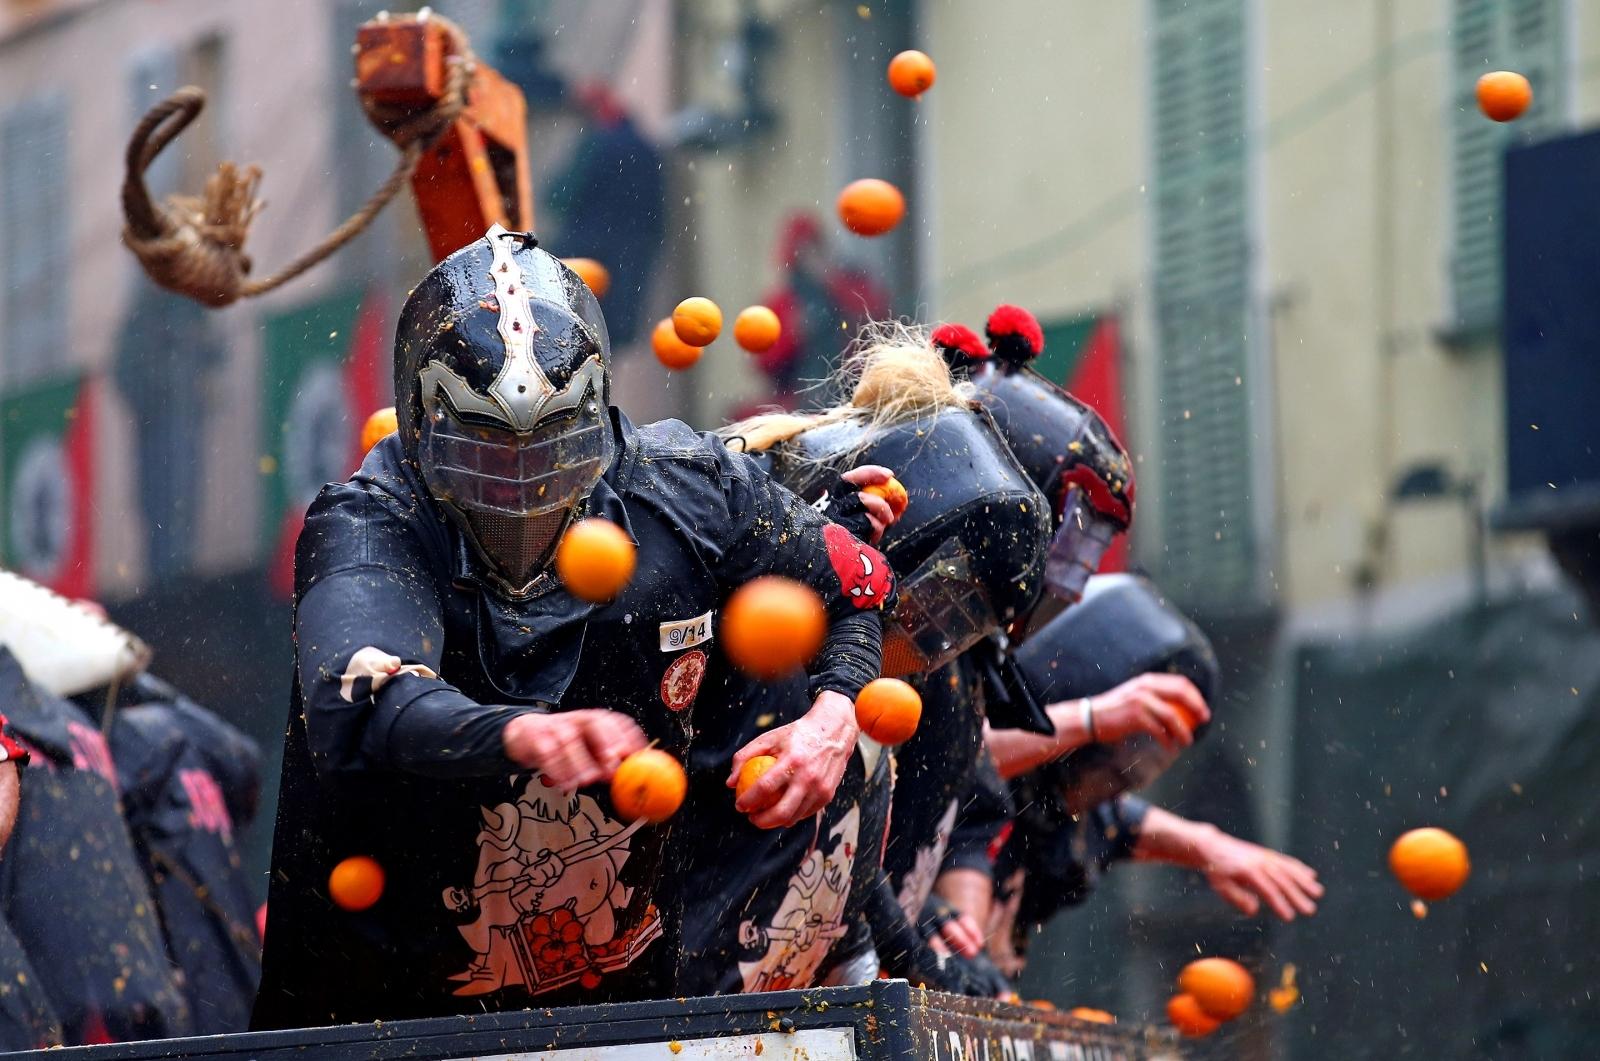 Ivrea carnival 2018 oranges